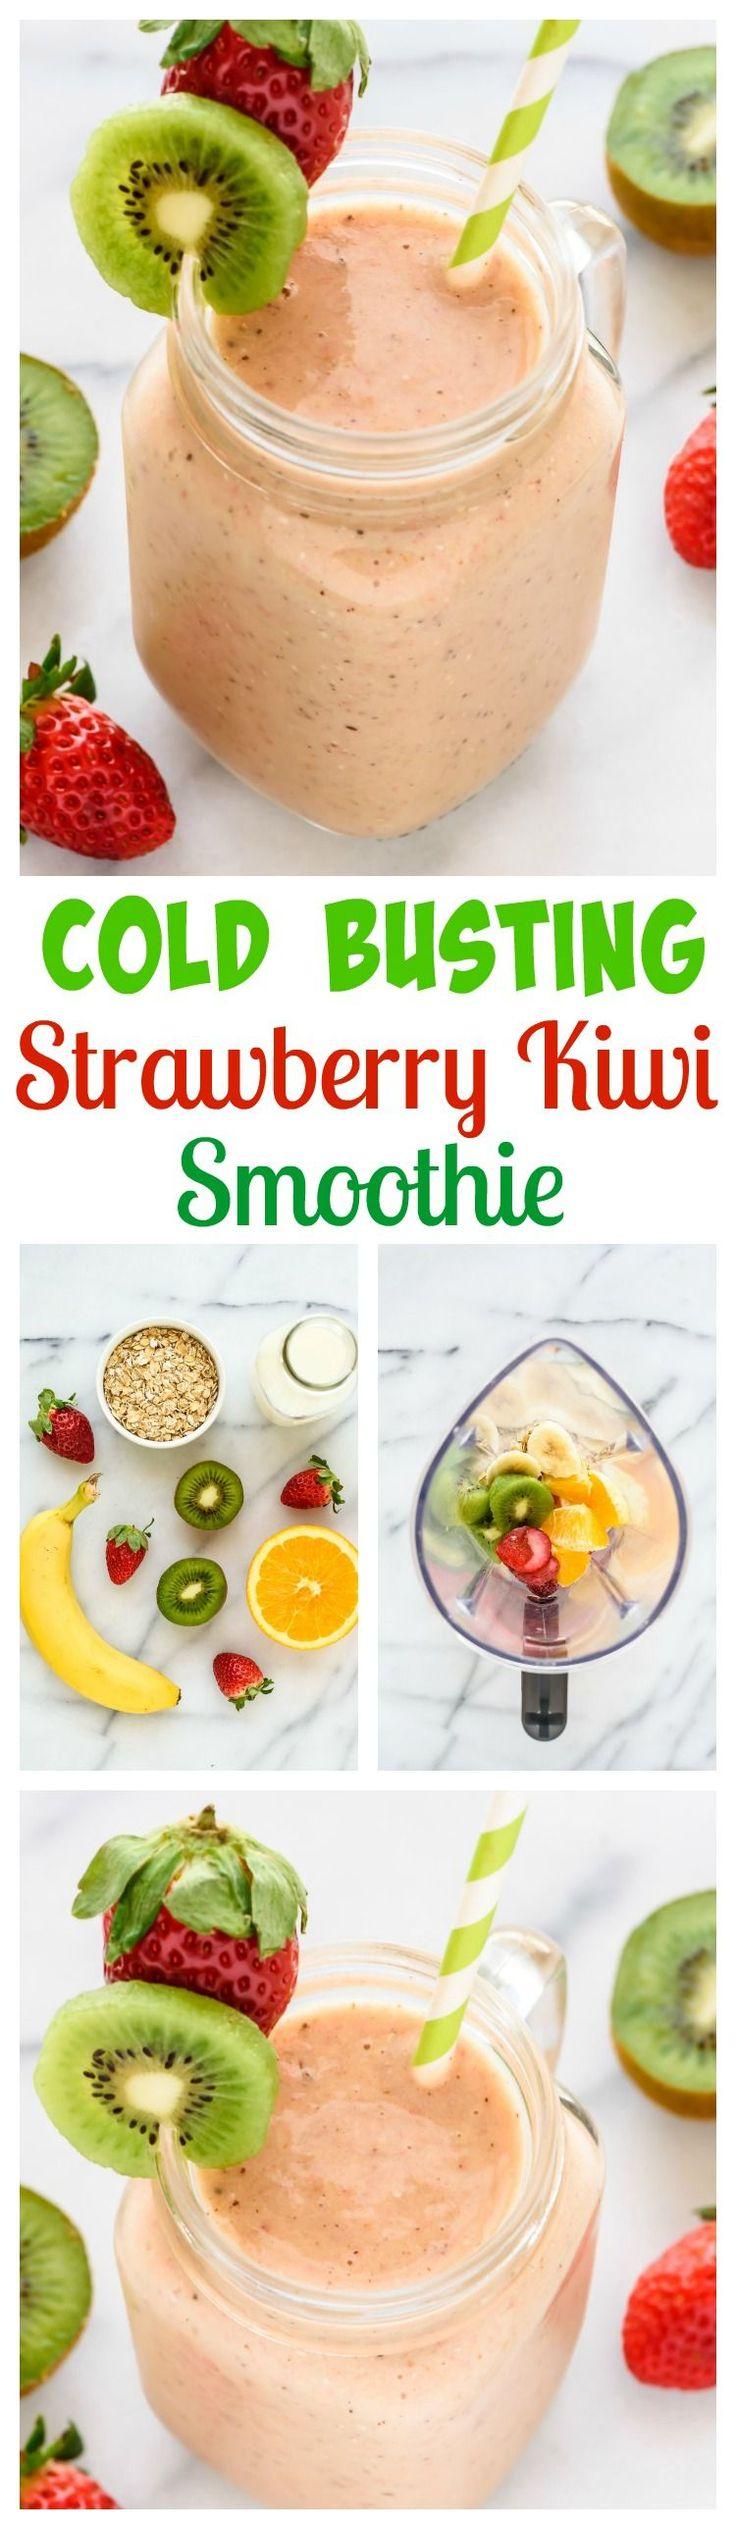 how to make strawberry and kiwi smoothie